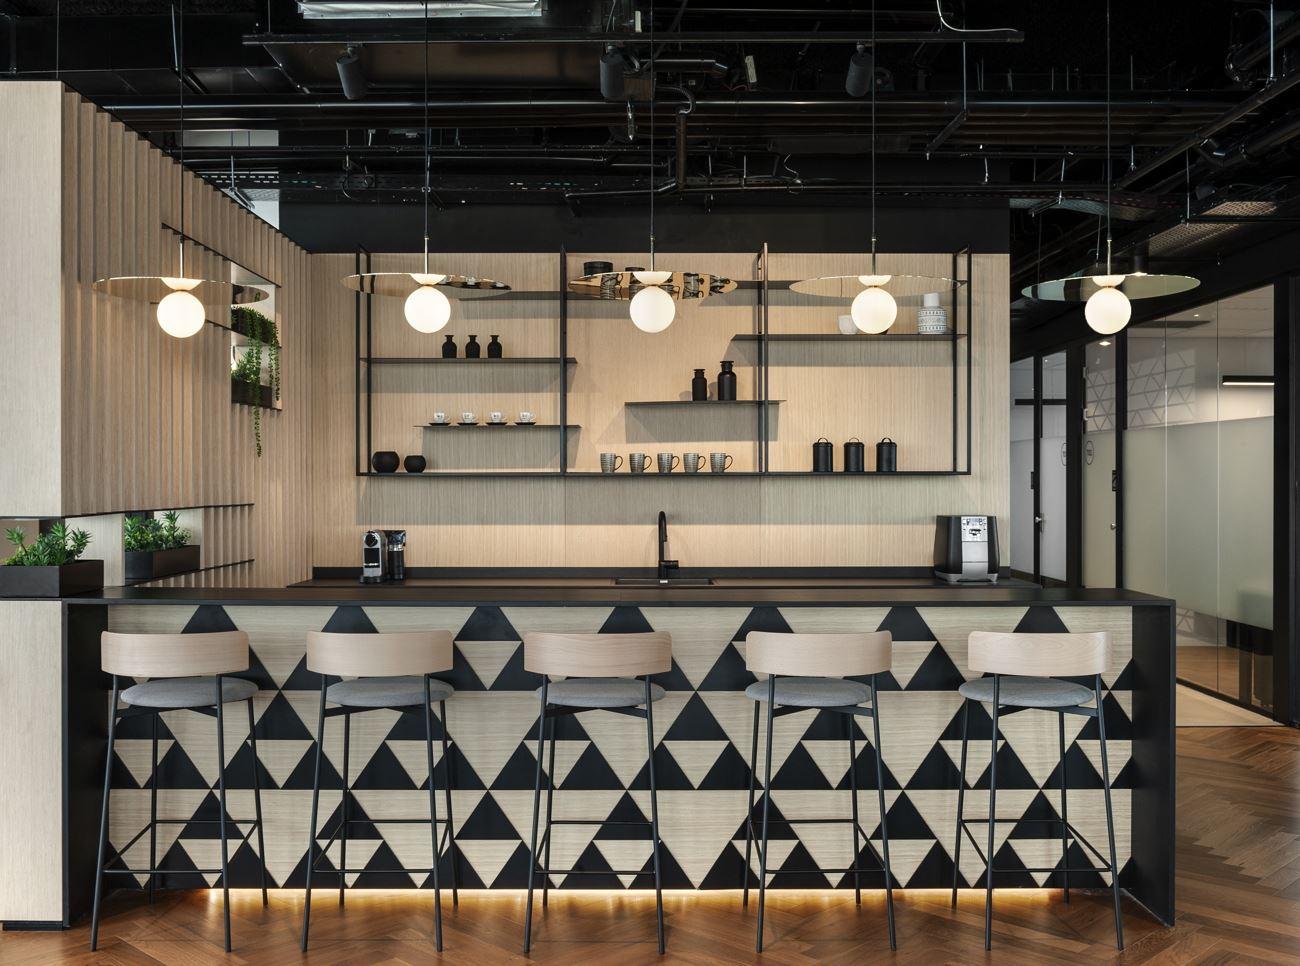 Innovation Offices גופי תאורות מעל בר הקפה בעיצובו של קמחי דורי